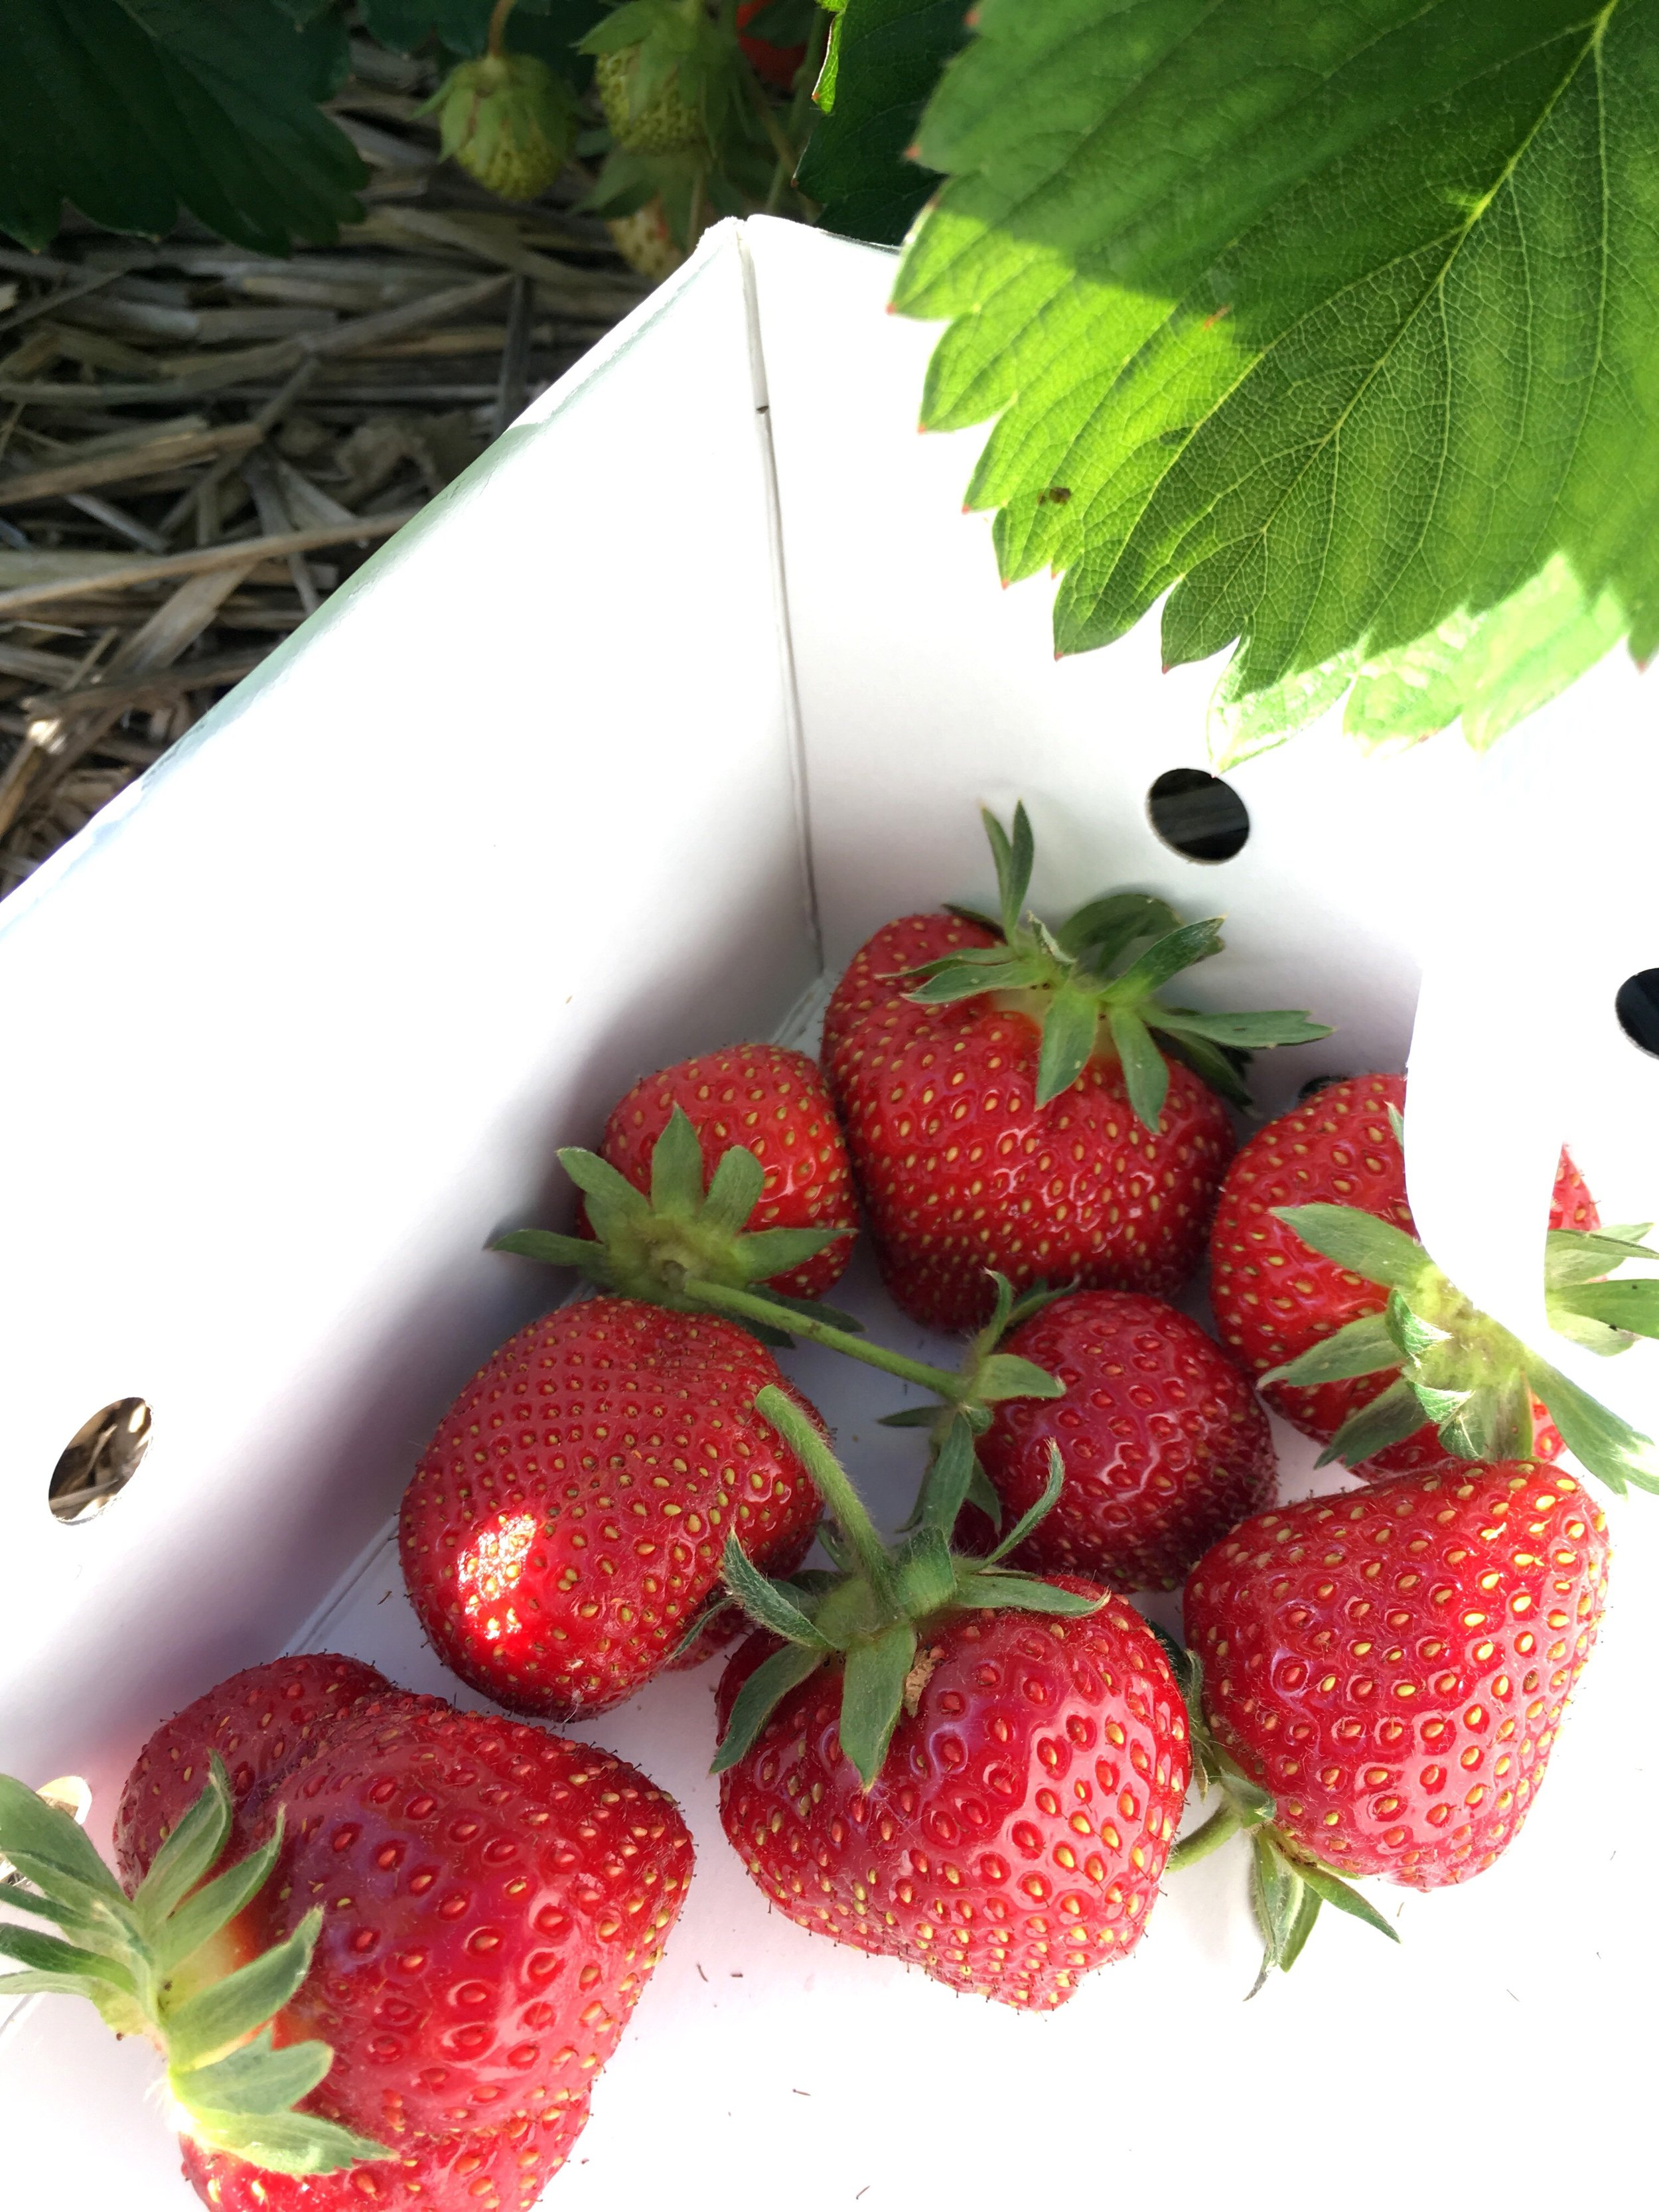 Favorite Strawberry Desserts Visit To Huhn Strawberry Farm Moncharis